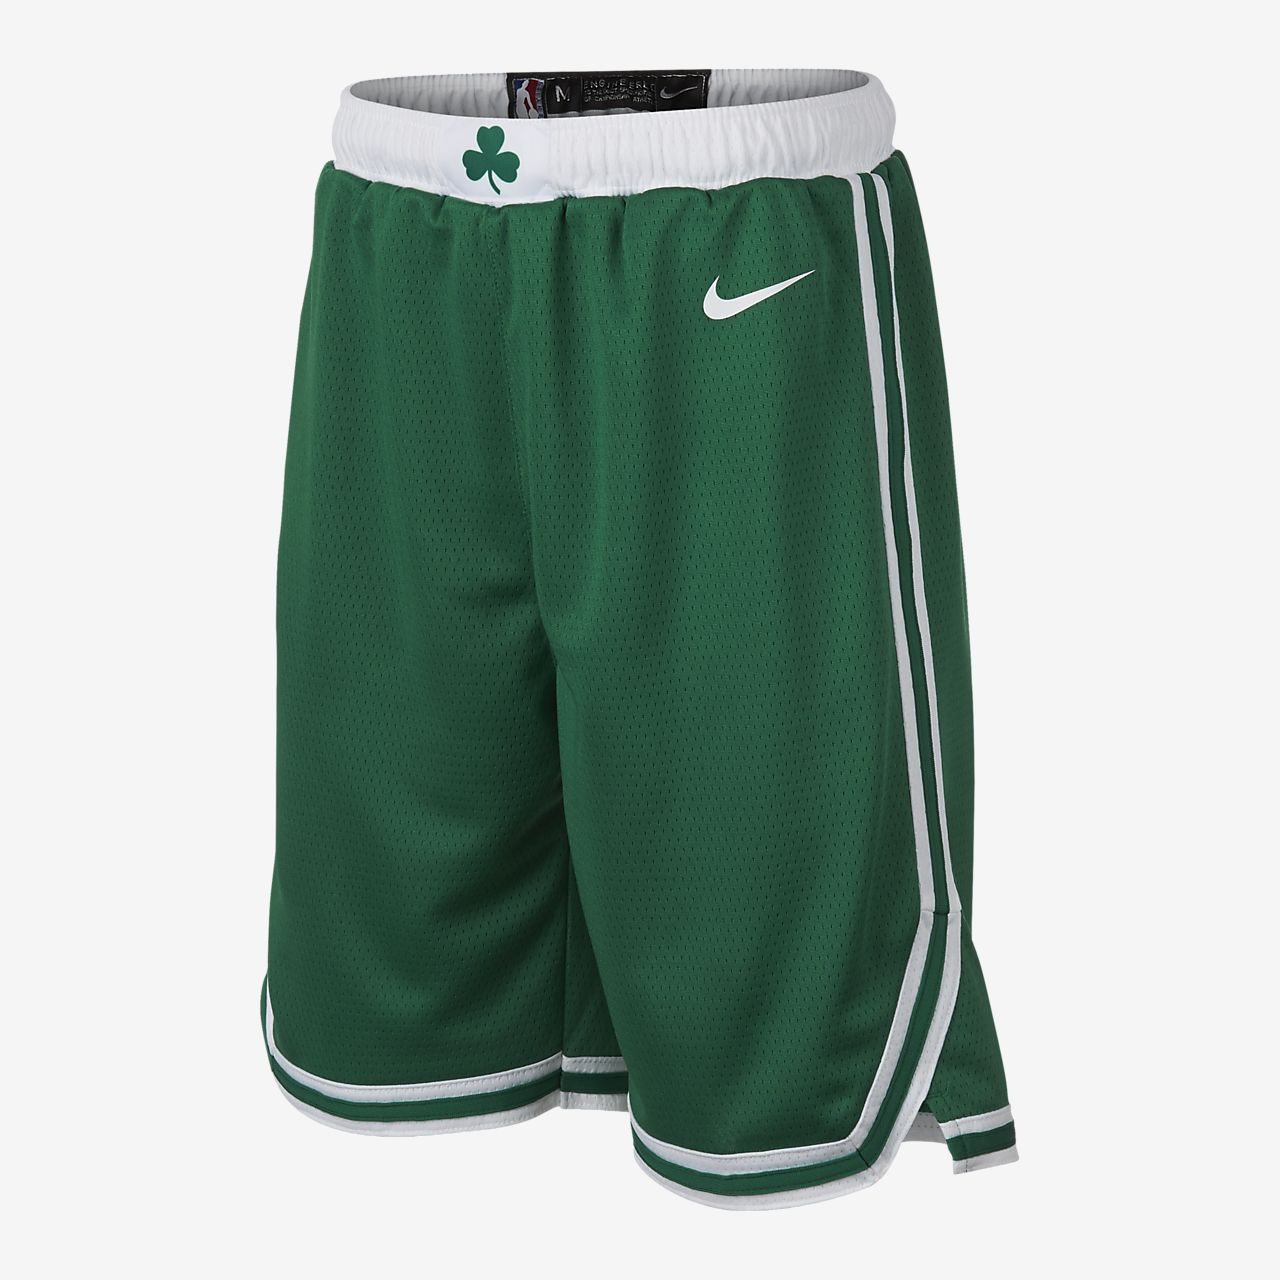 49b808e02 Boston Celtics Nike Icon Edition Swingman Big Kids  (Boys ) NBA ...